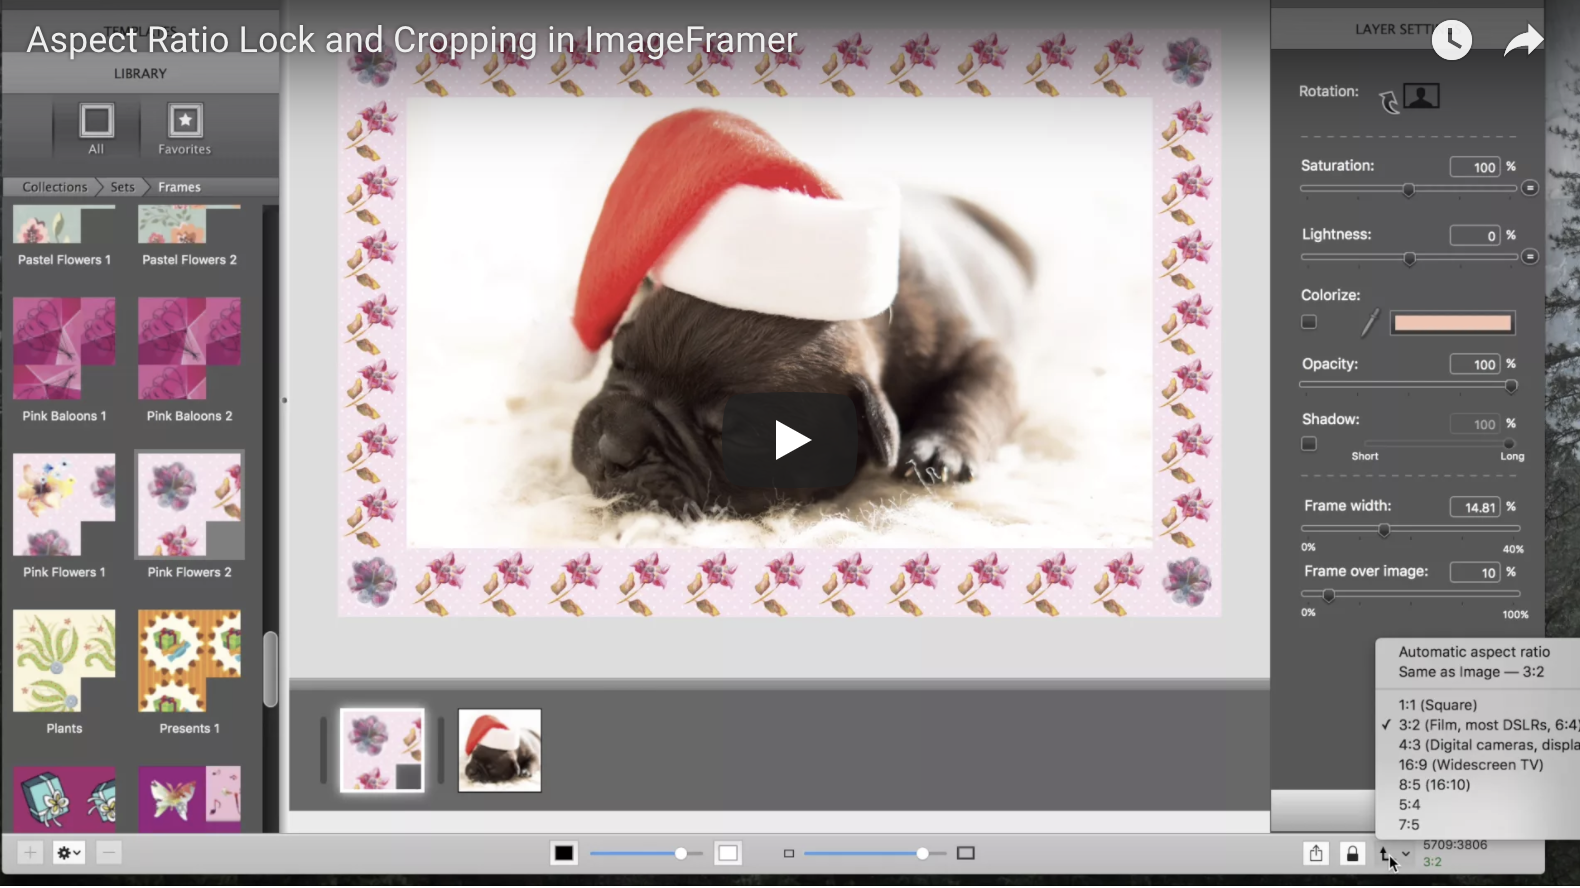 Aspect ratio locking in ImageFramer 3.4